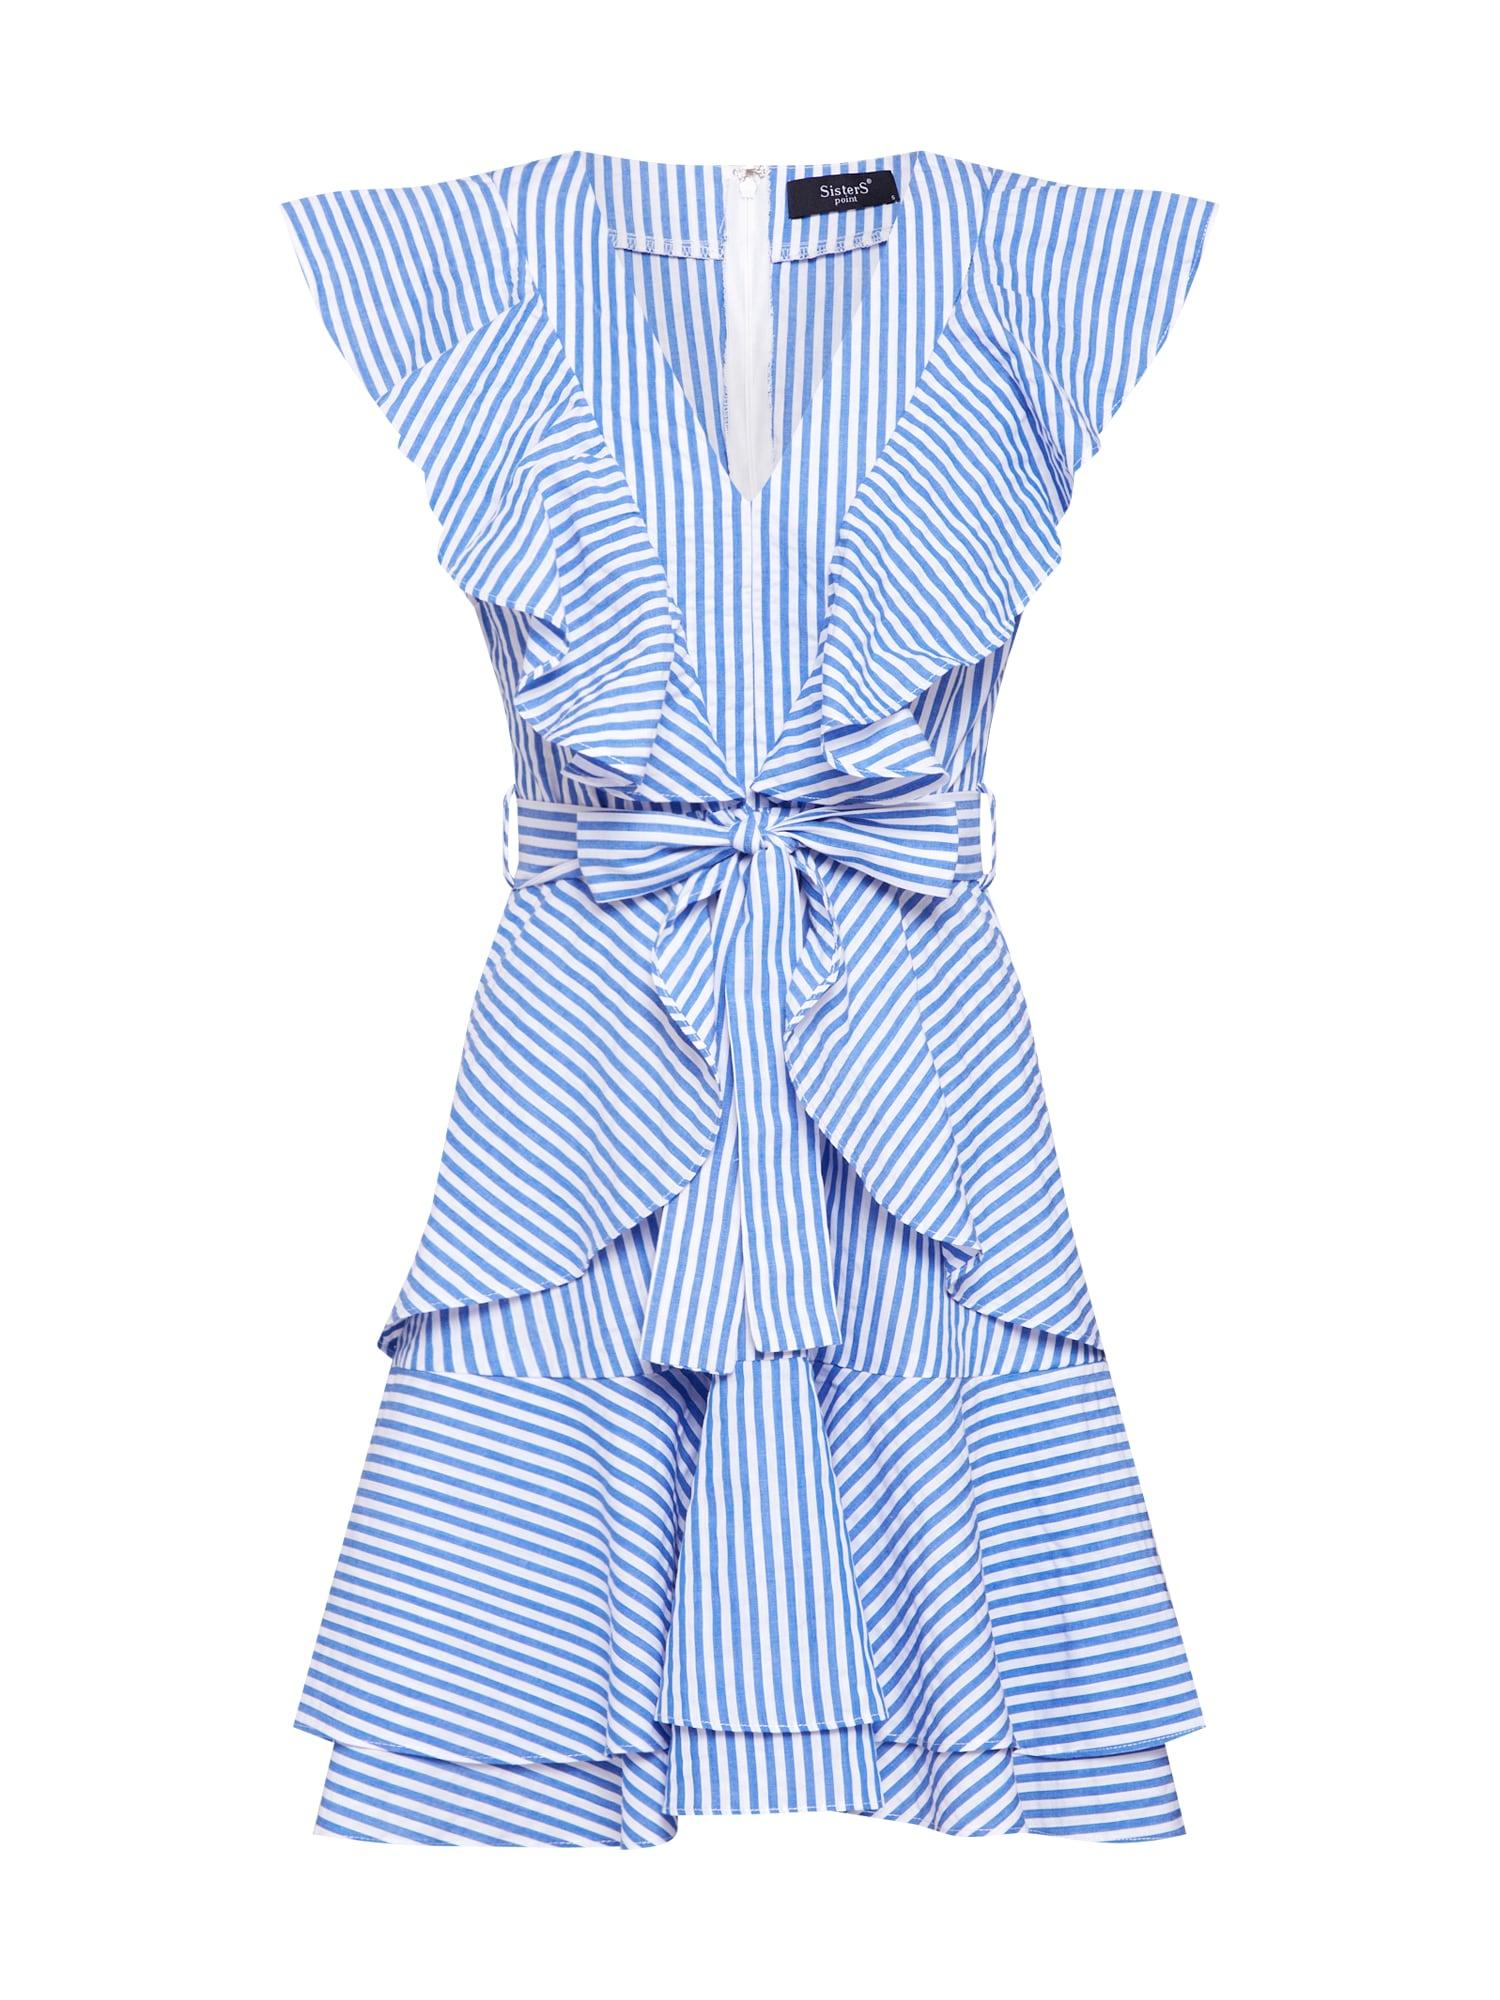 Letní šaty EVAN-DR blau weiß SISTERS POINT